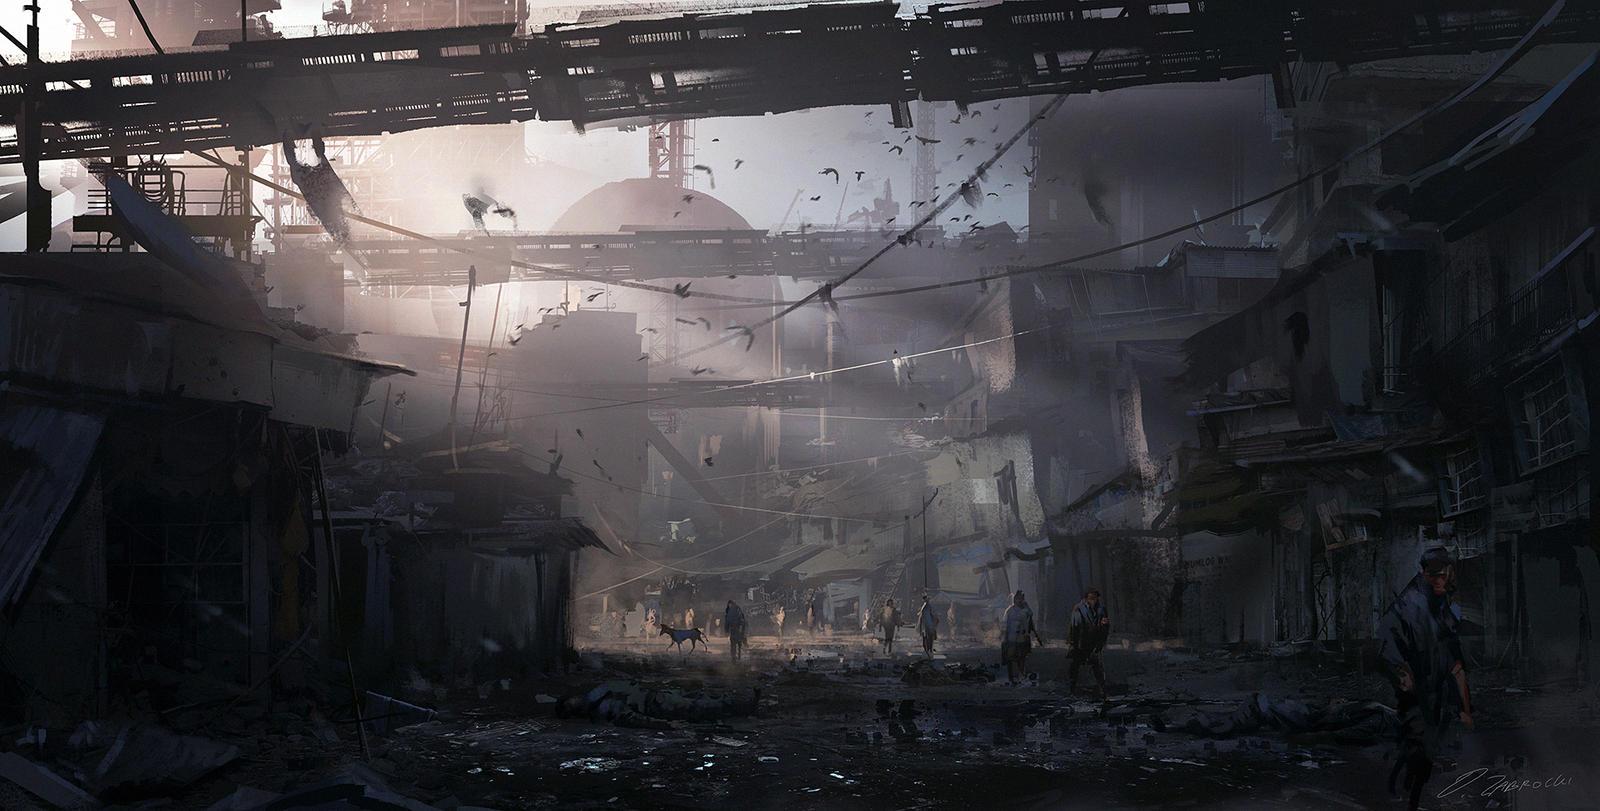 https://img00.deviantart.net/2b16/i/2016/089/b/e/industrialized_slums_by_daroz-d9x1lyd.jpg